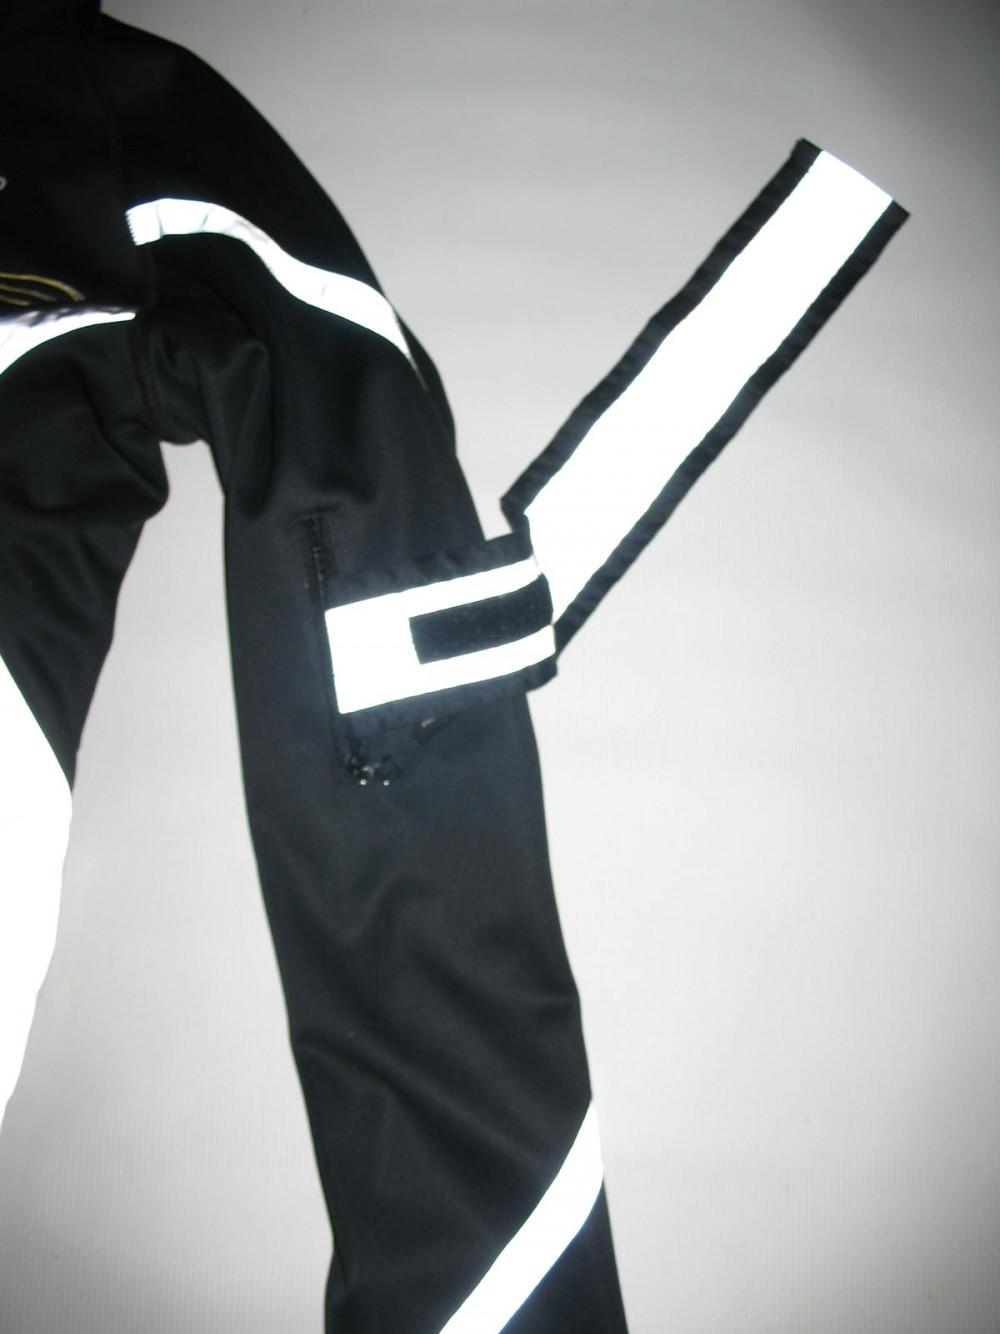 Велокуртка BTWIN aero sl cycling jacket (размер М) - 6